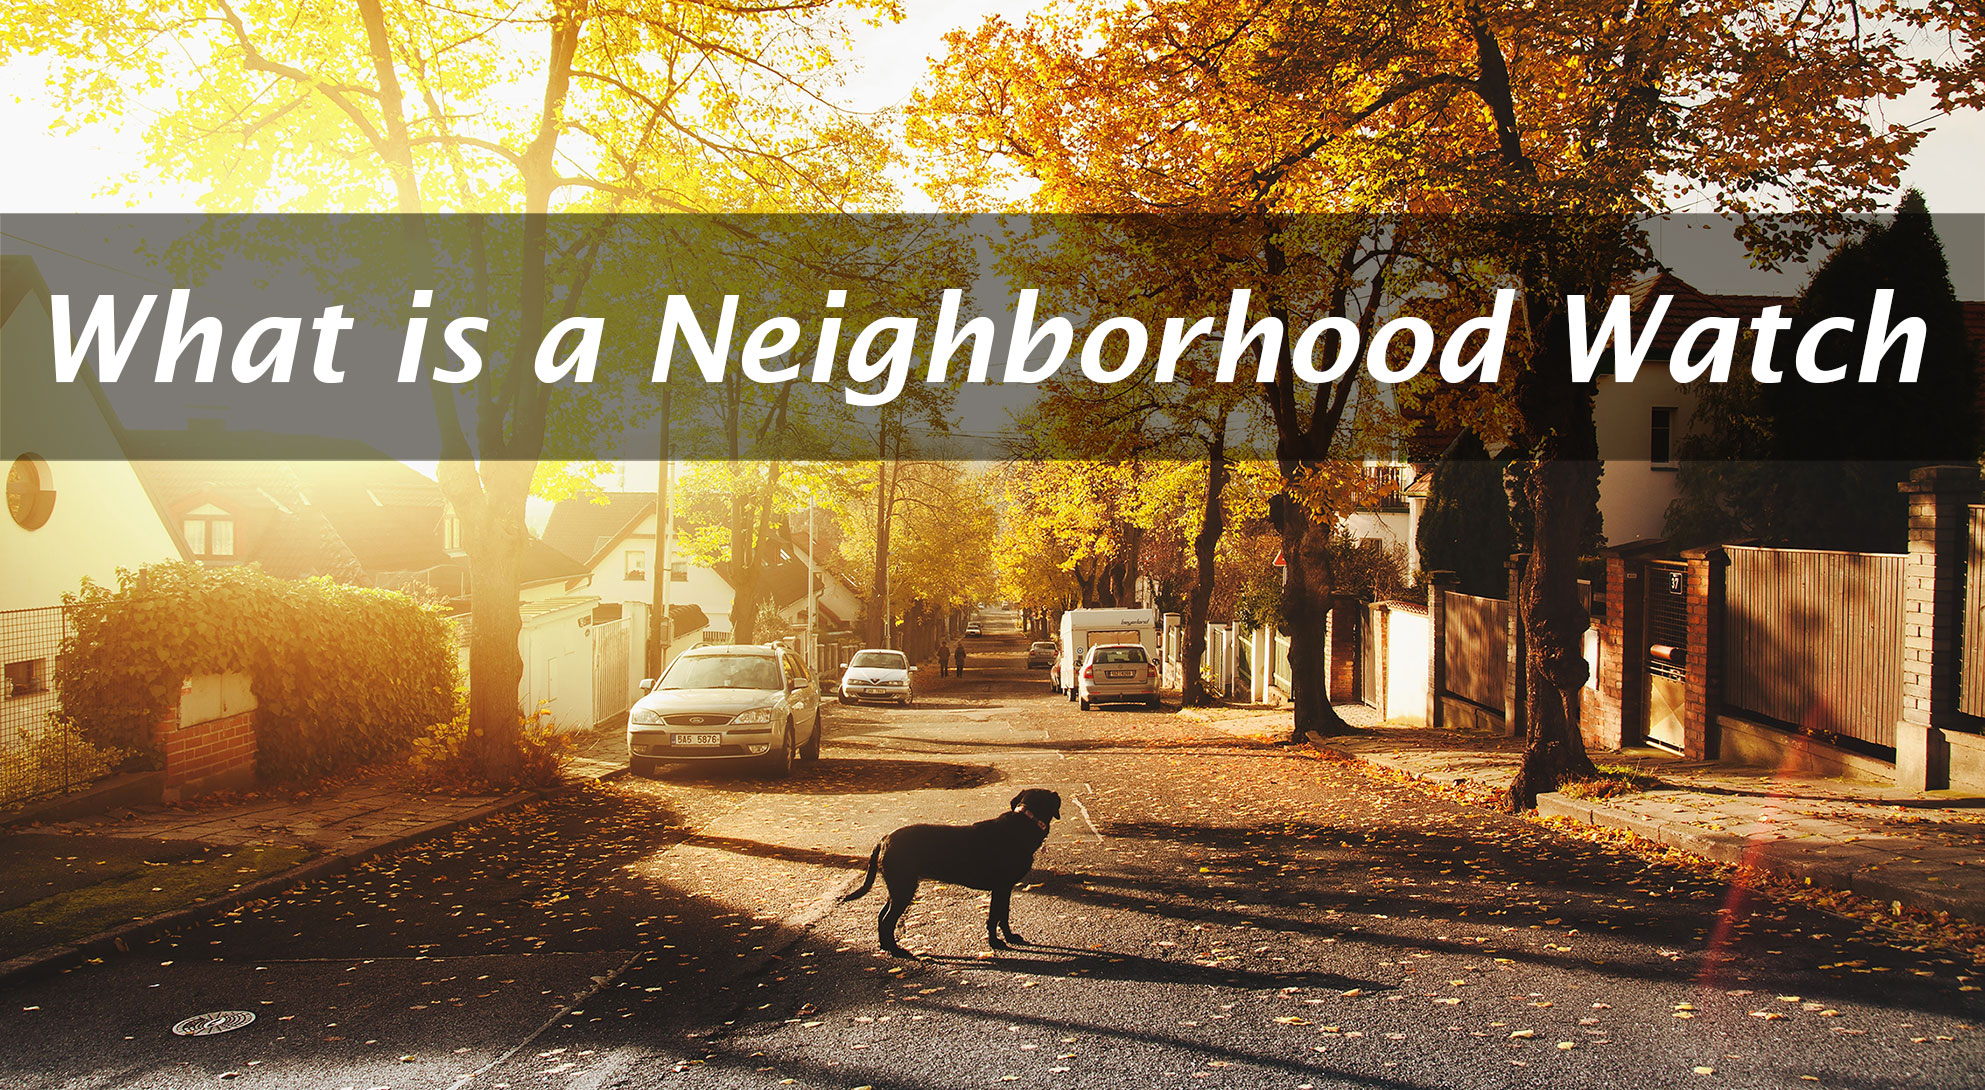 What is a Neighborhood Watch